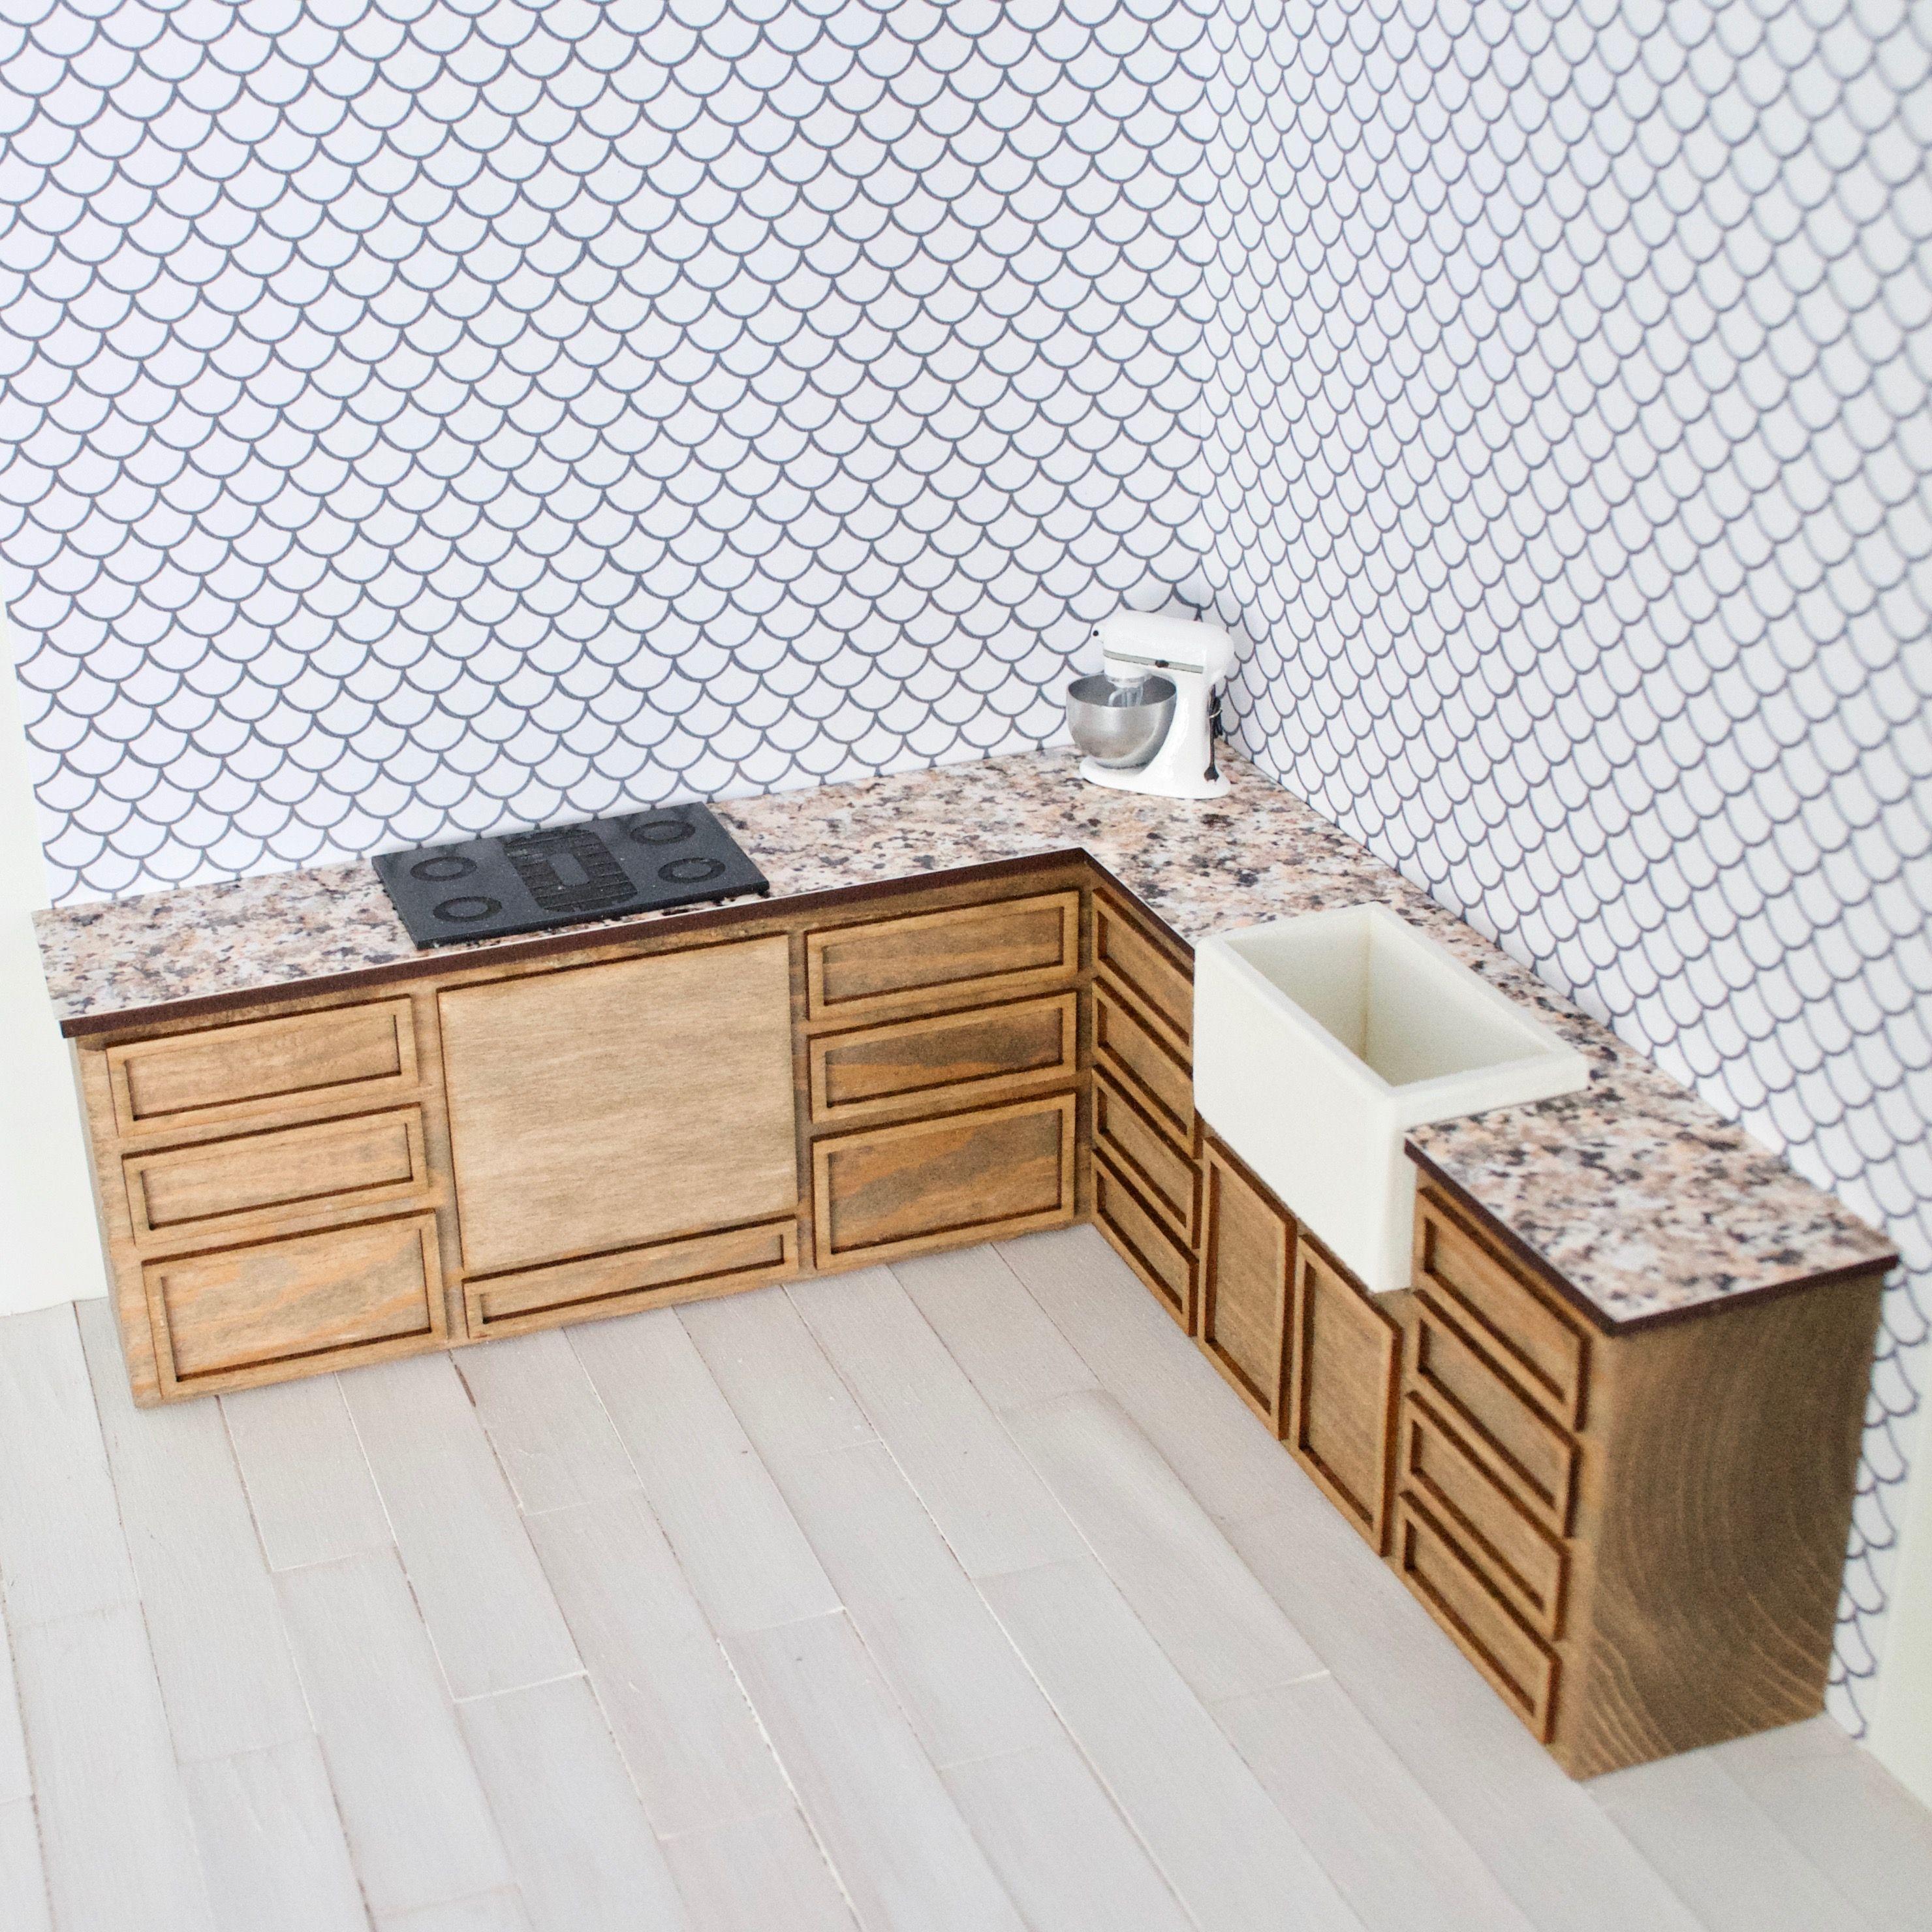 Dollhouse Kitchen Mini Kitchen Kitchen Cabinets Customized Kitchen Shaker Style Cabinets In 2020 Dollhouse Kitchen Decor Tutorials Furniture Decor